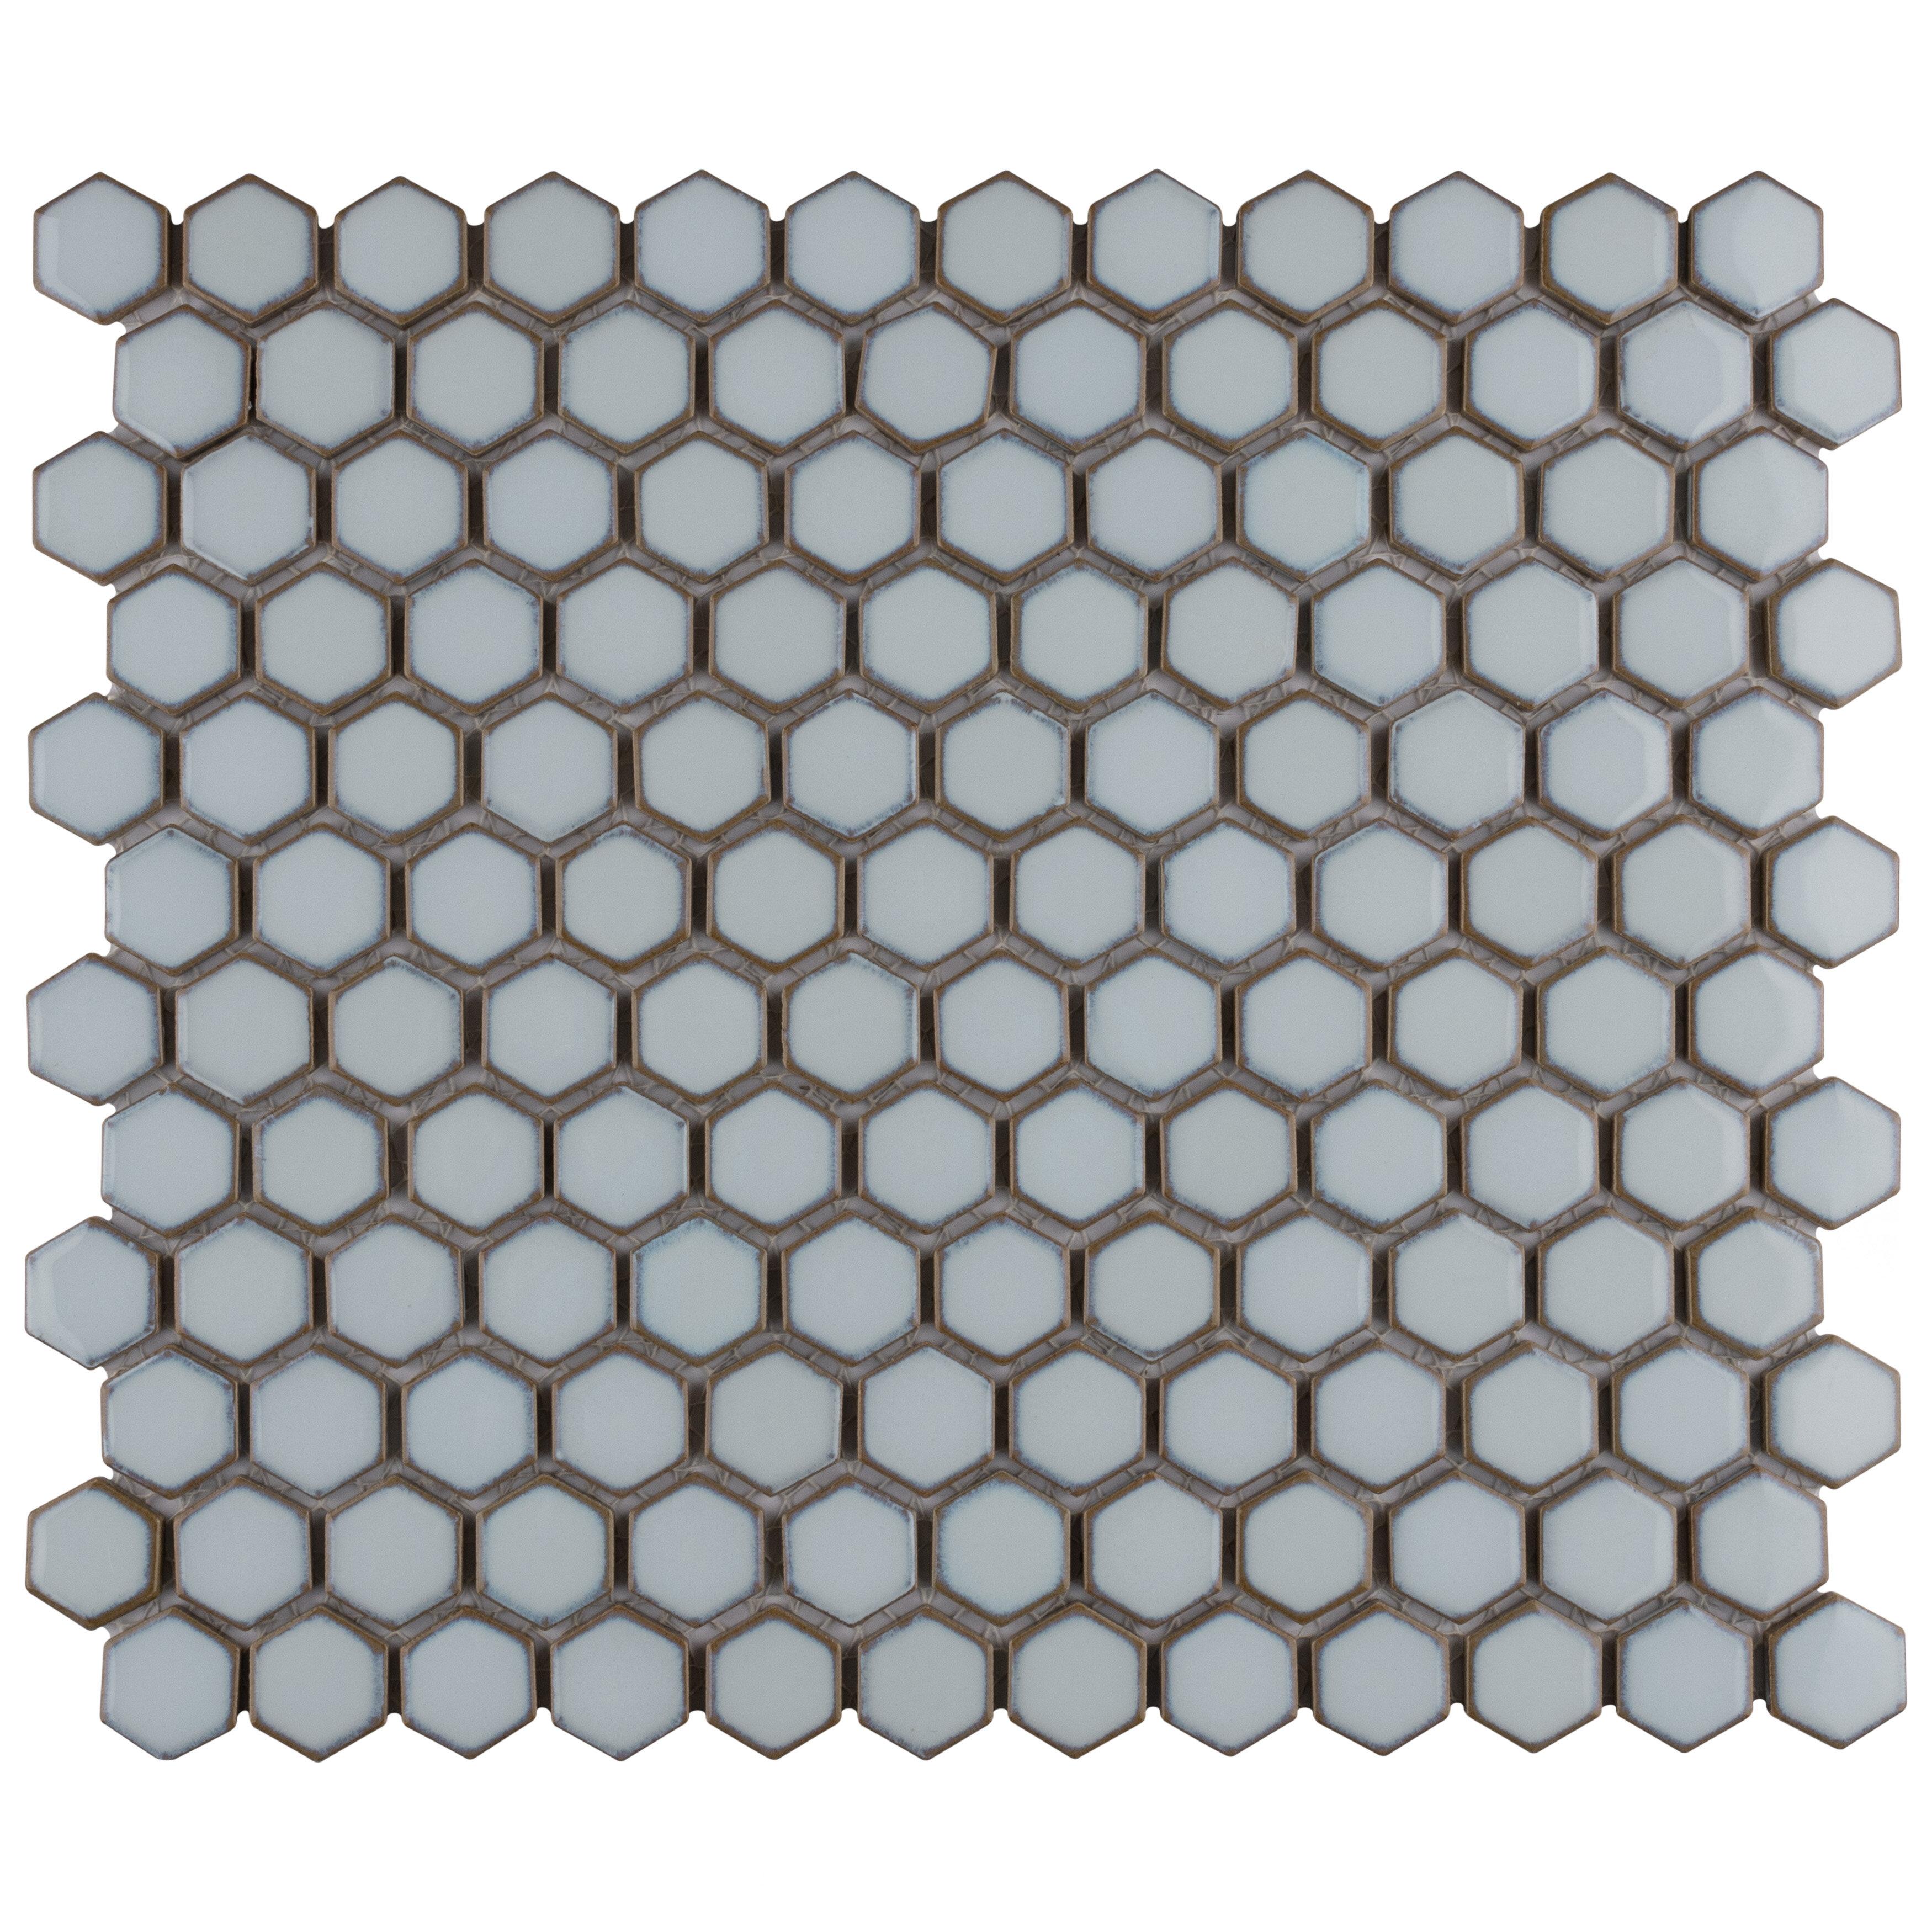 Porcelain Floor Tiles Wall Tiles Free Shipping Over 35 Wayfair